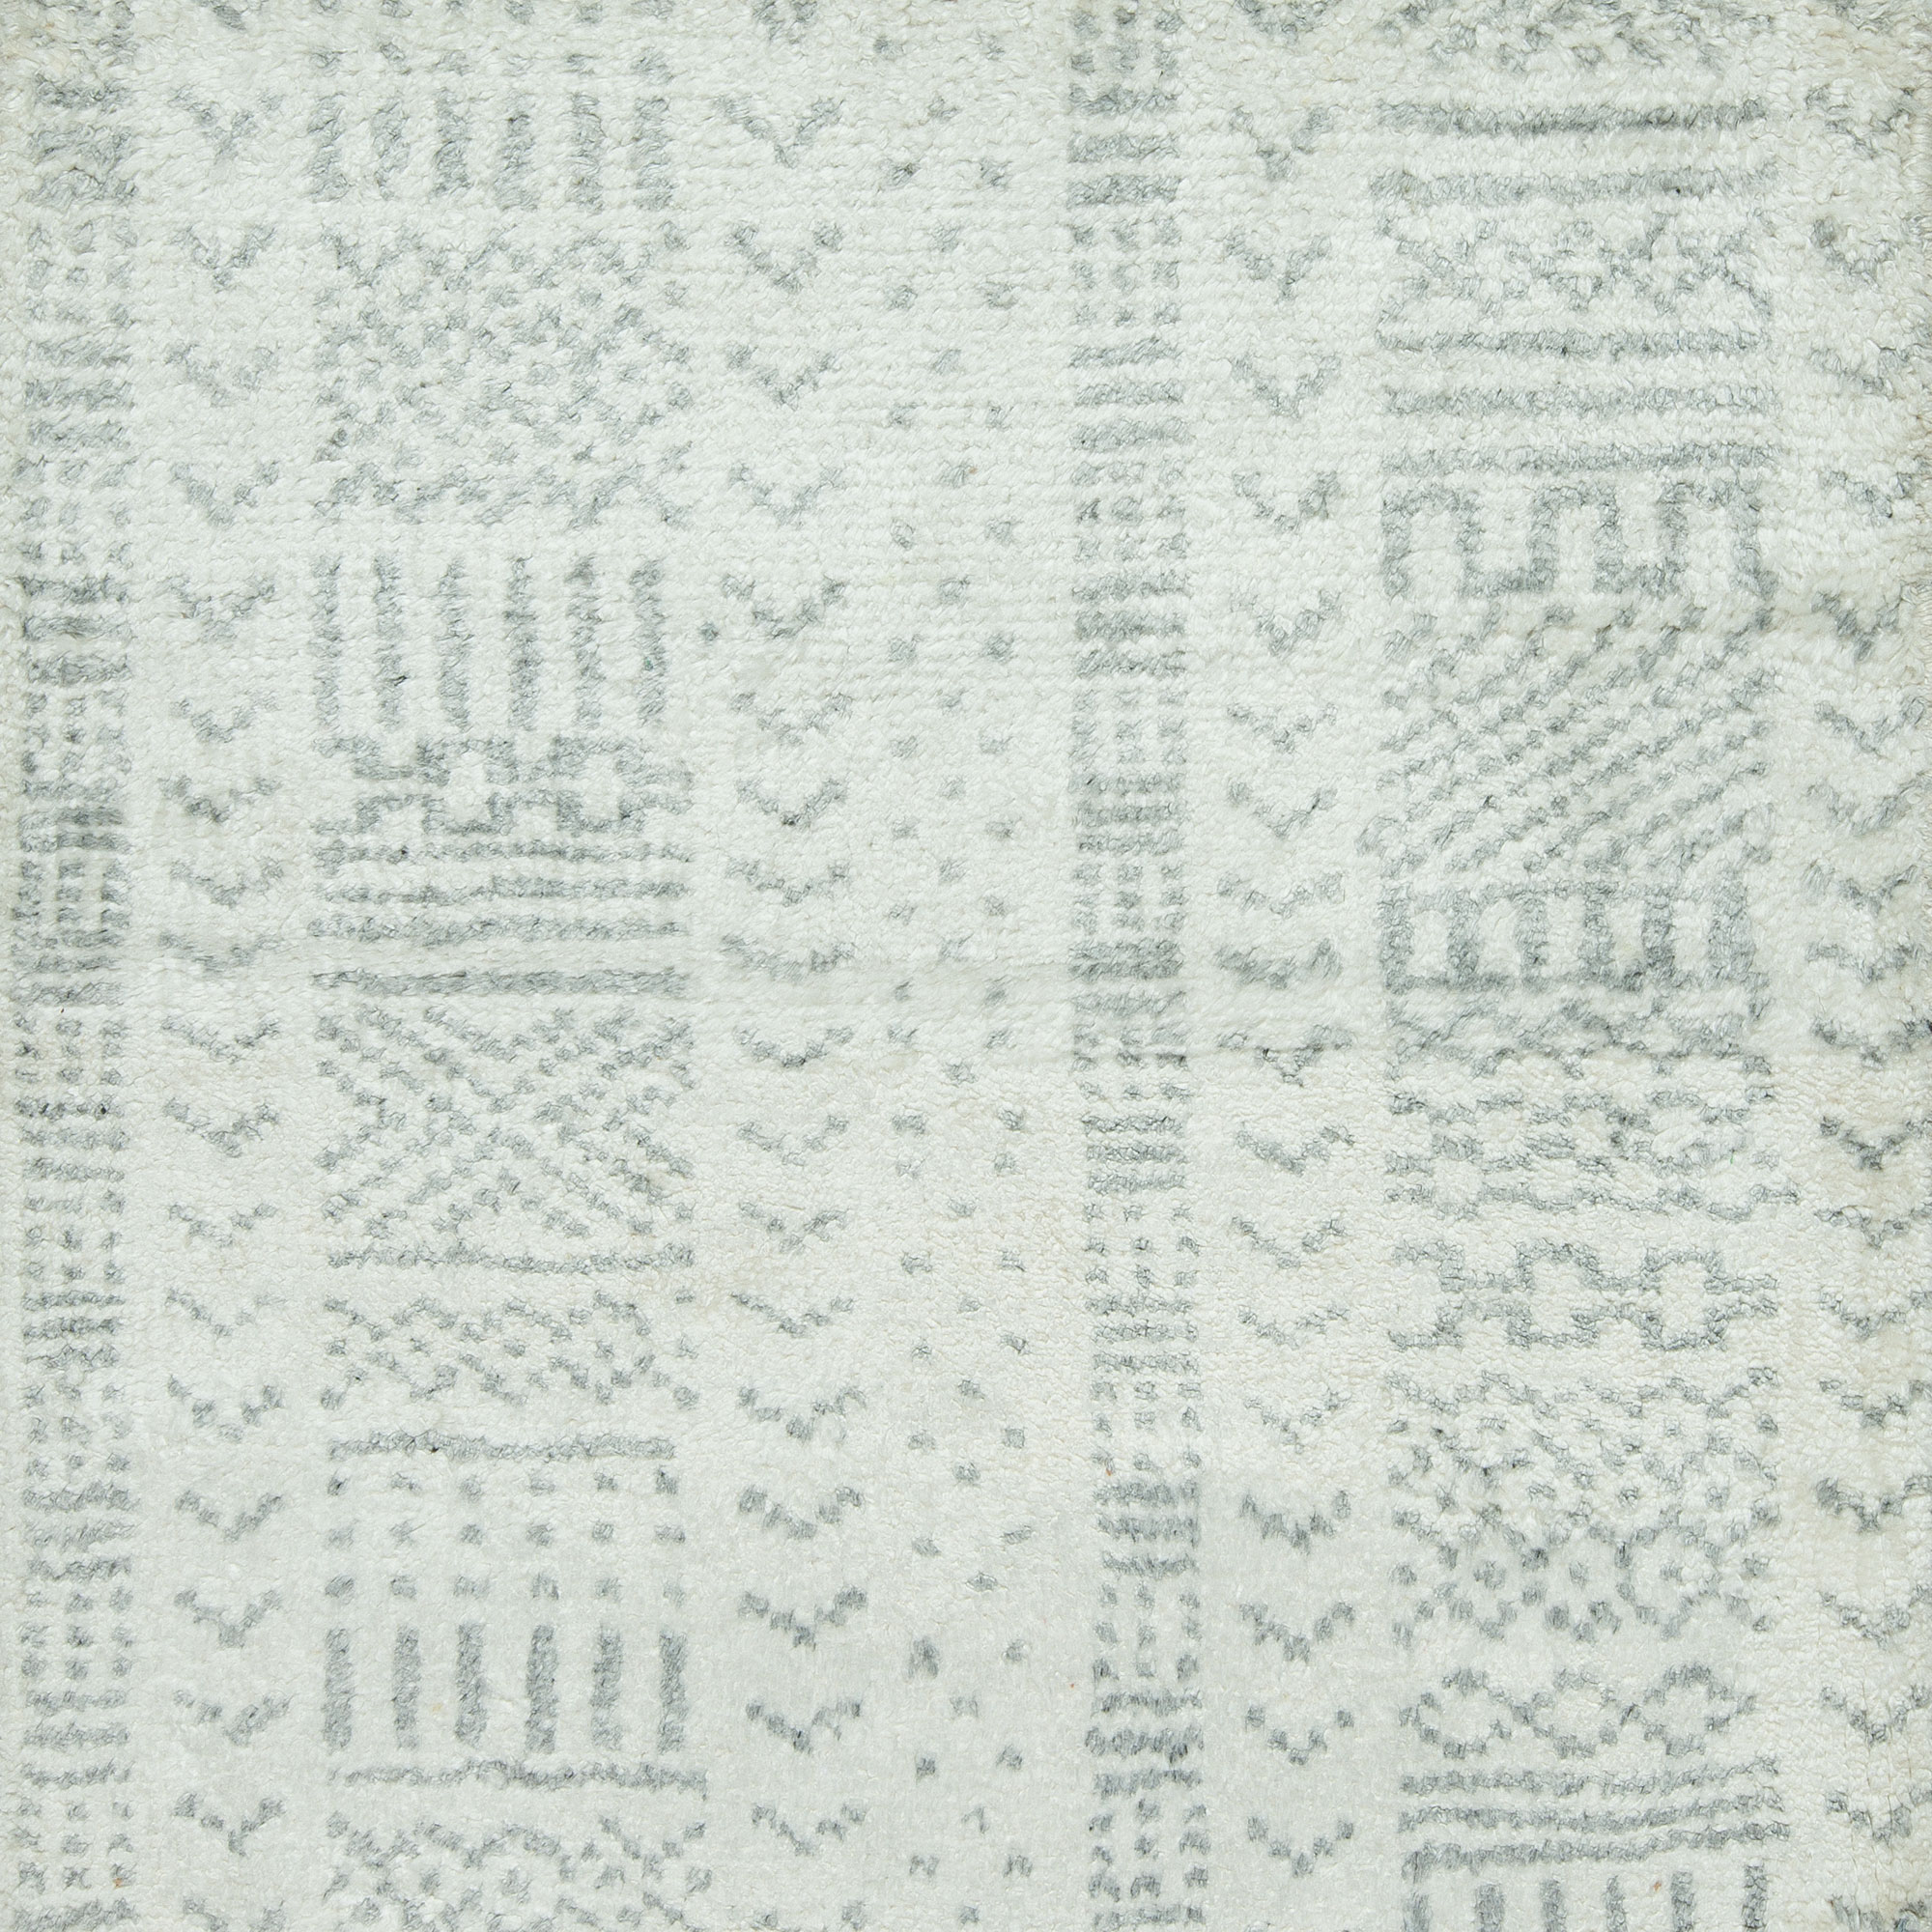 Geometric Design S11121 S11121